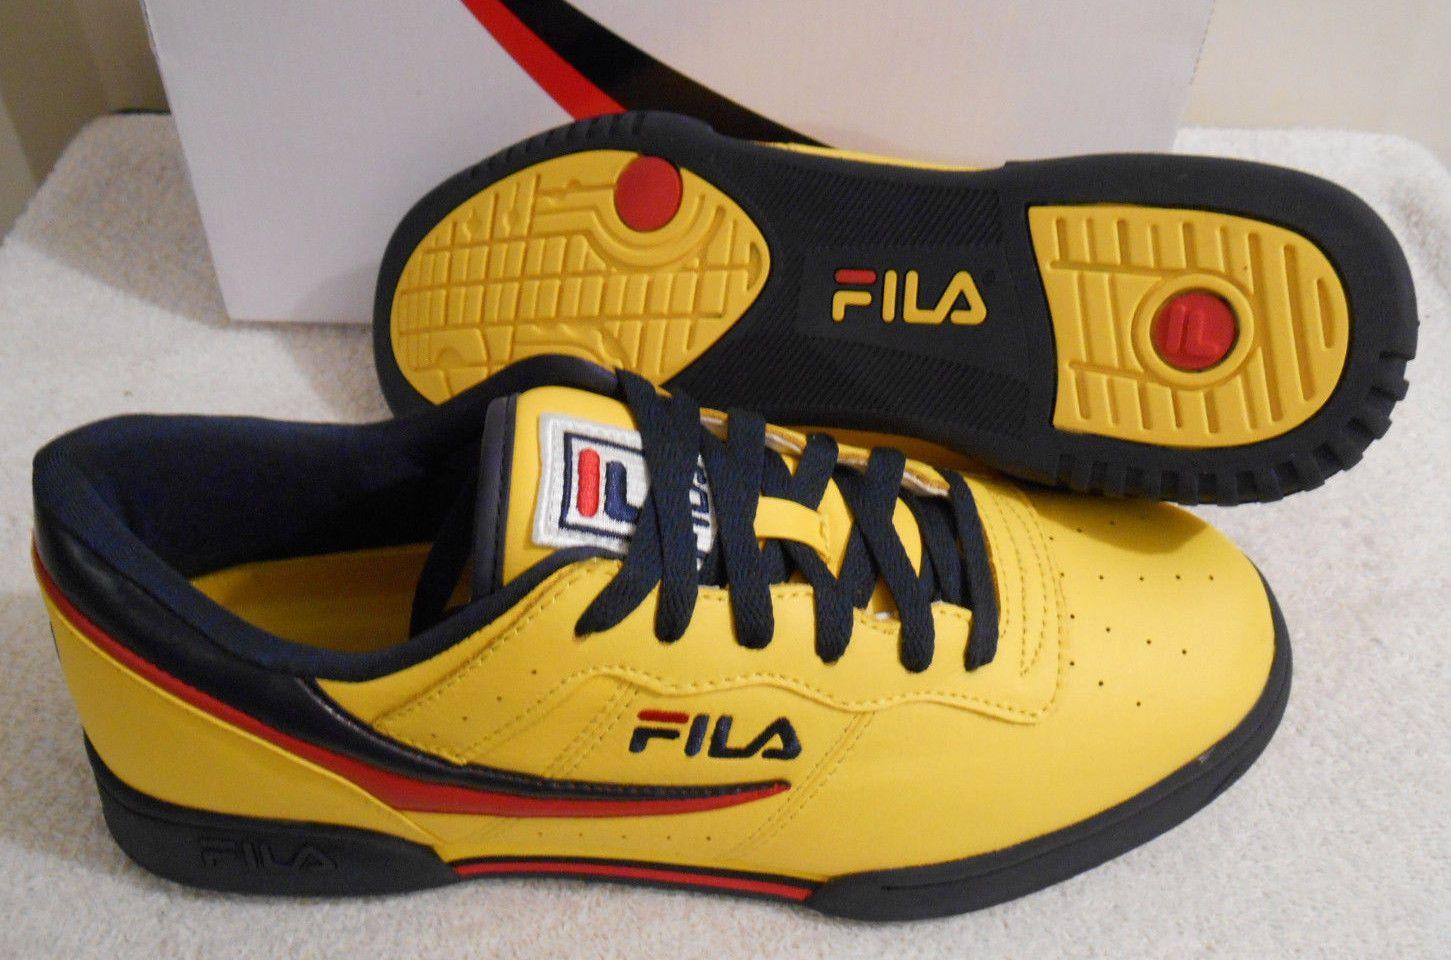 7cd96e8317dd Men s FILA Original Fitness Lemon Navy Red Sneakers Shoes Size 12  1FM00081-732